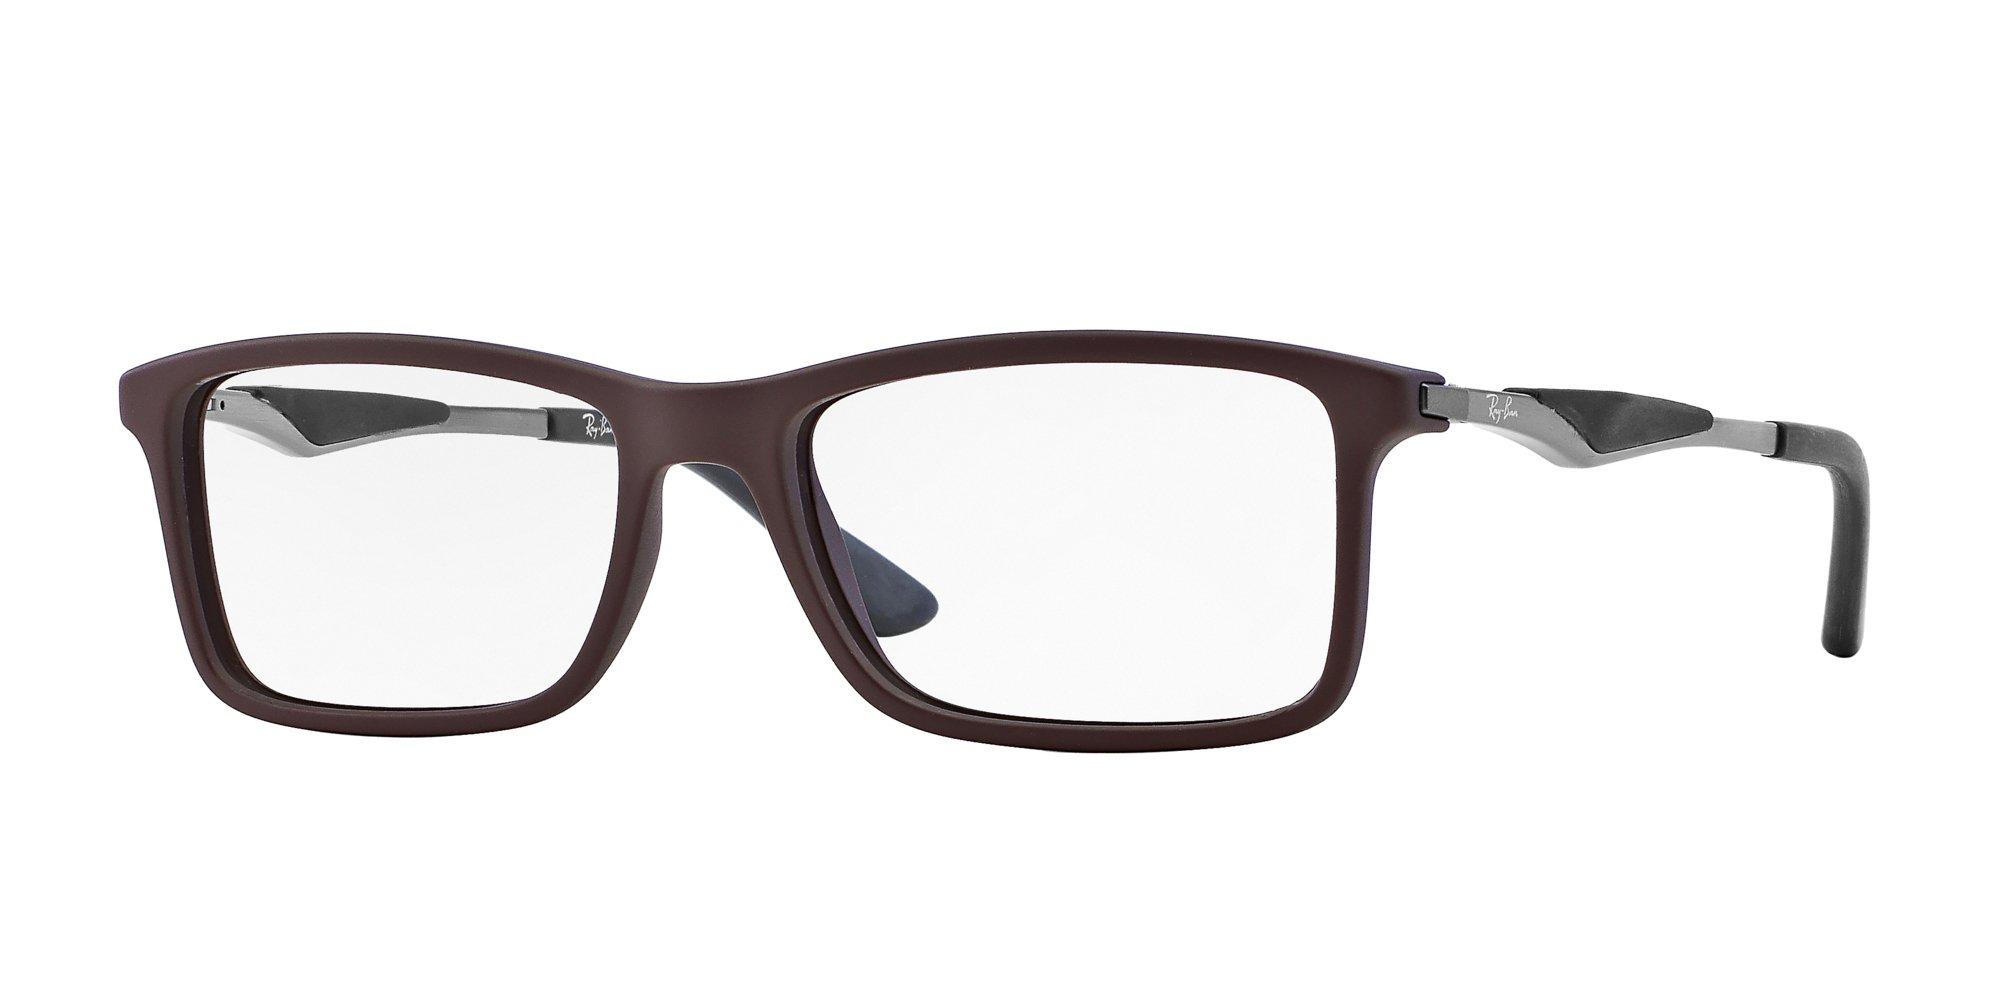 Ray-Ban Men's RX7023 Eyeglasses Top Brown On Matte Black 53mm